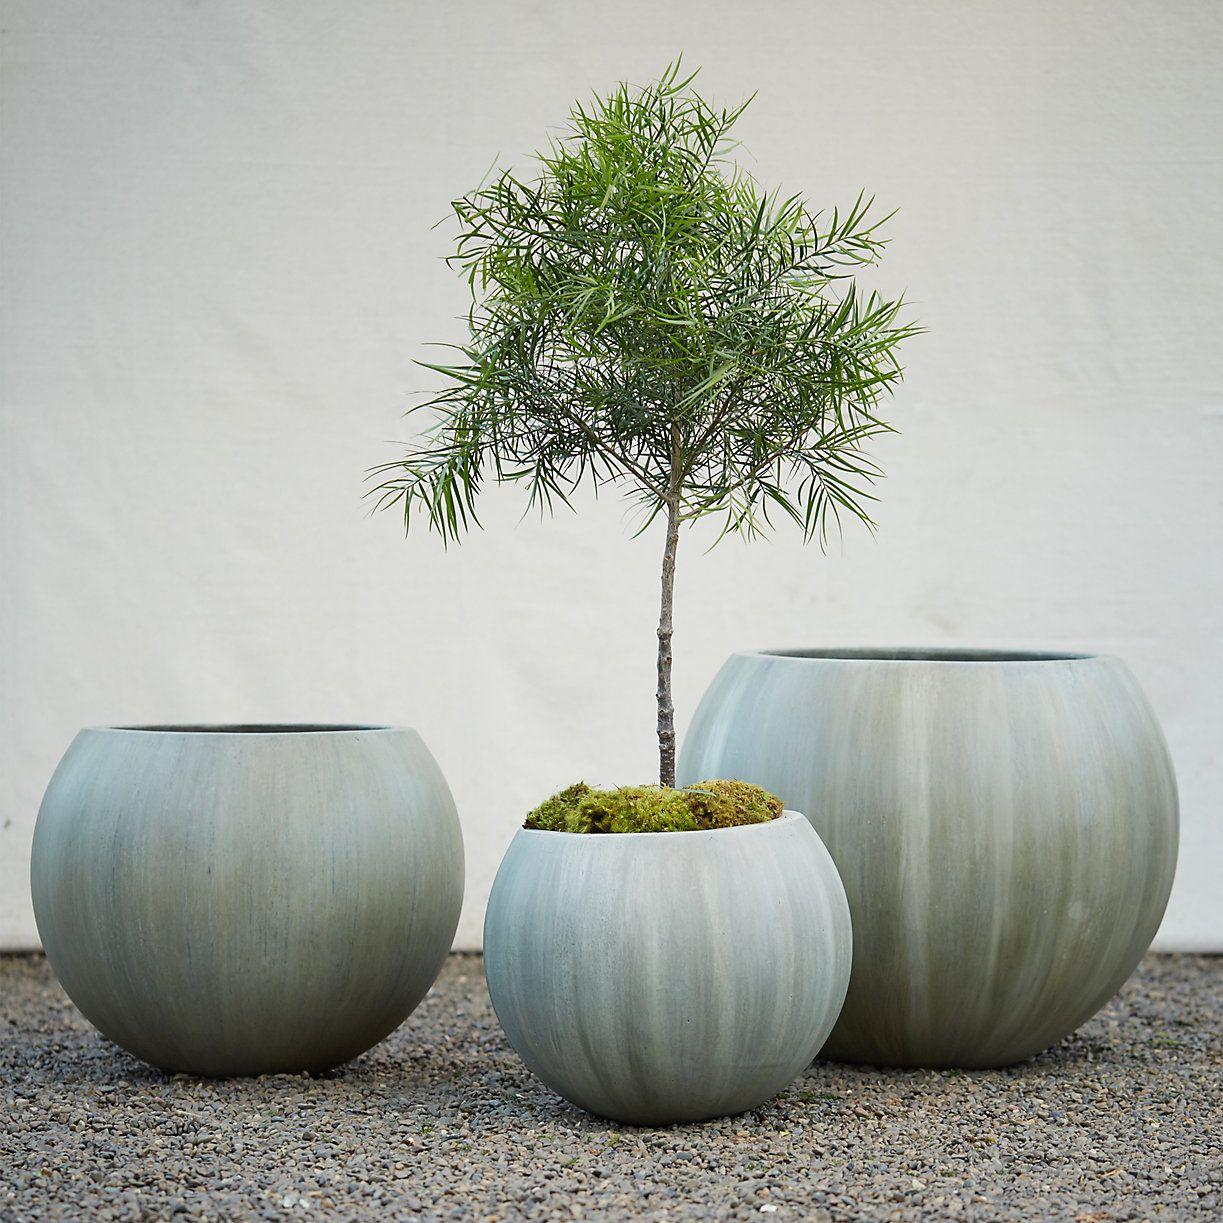 mossy fiber globe planter